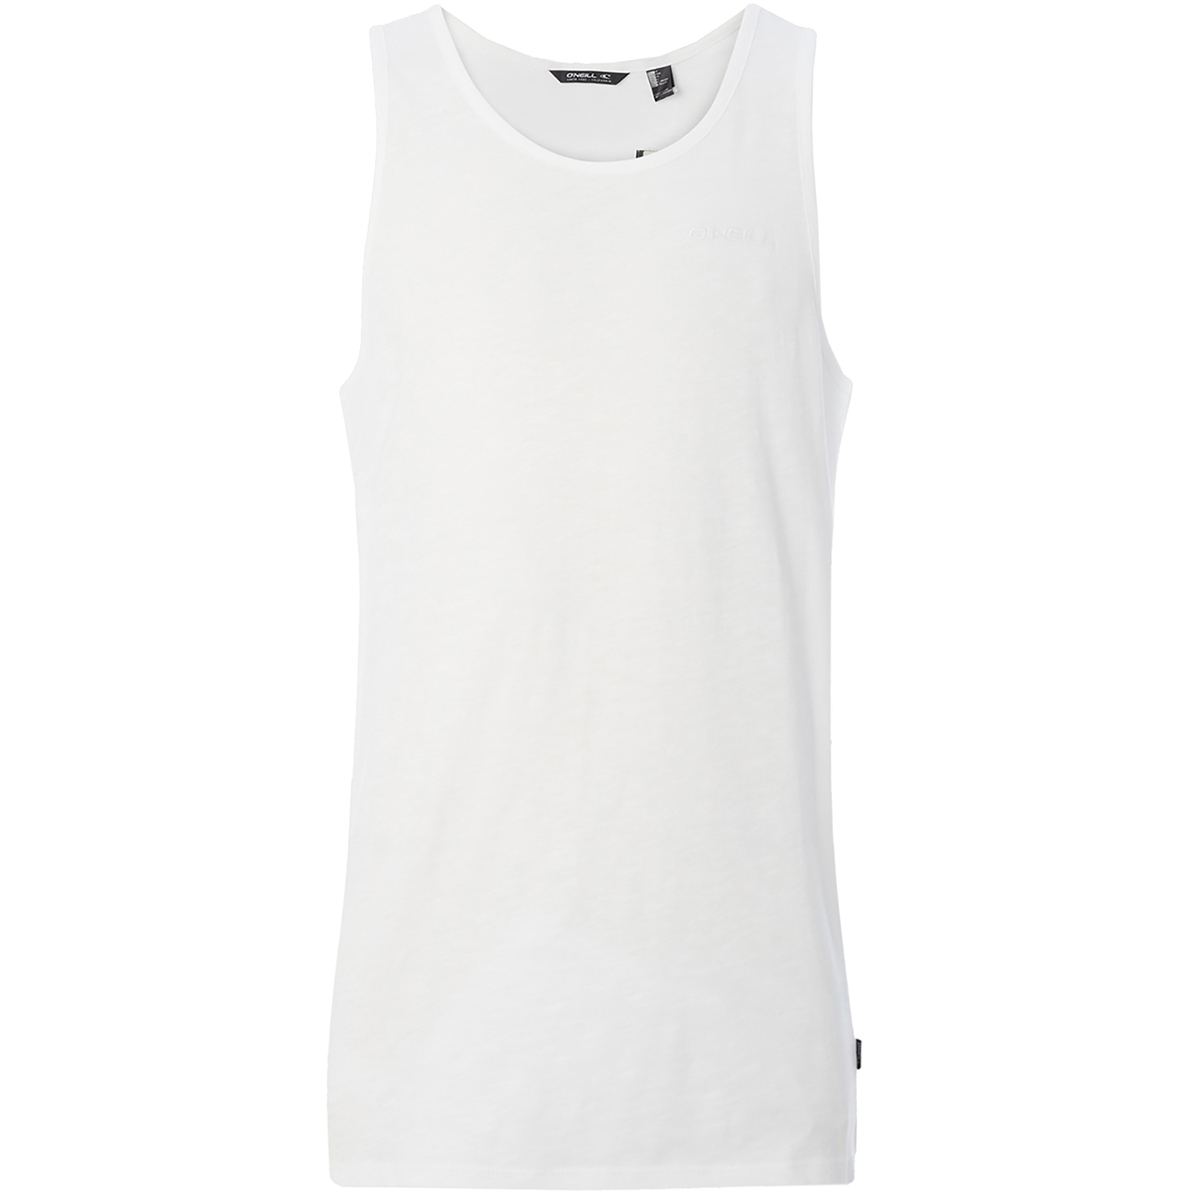 lm tanktop 0a1900 o`neill t-shirt 1030 powder white